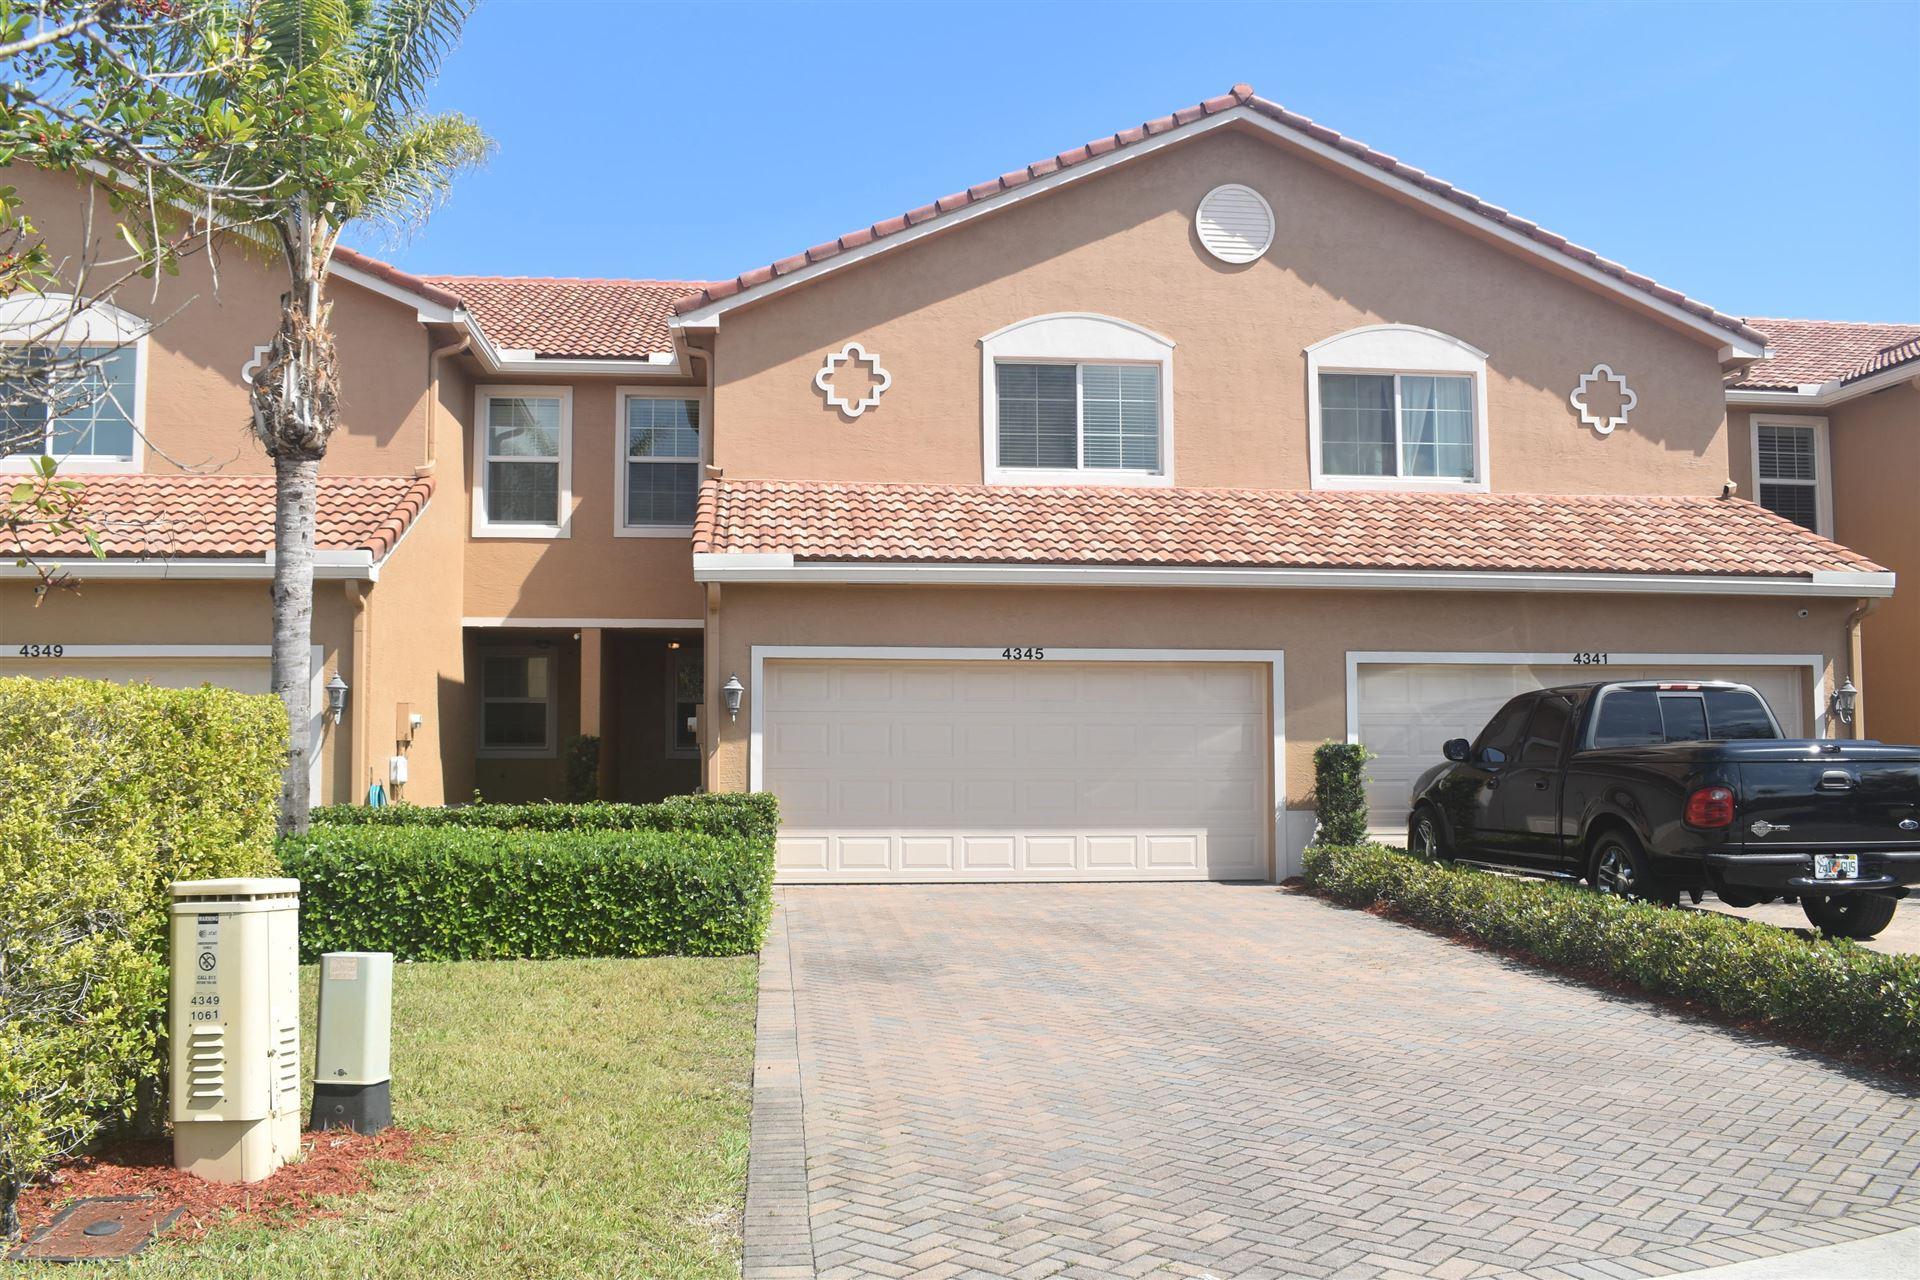 4345 Colony View Drive, Lake Worth, FL 33463 - #: RX-10606699